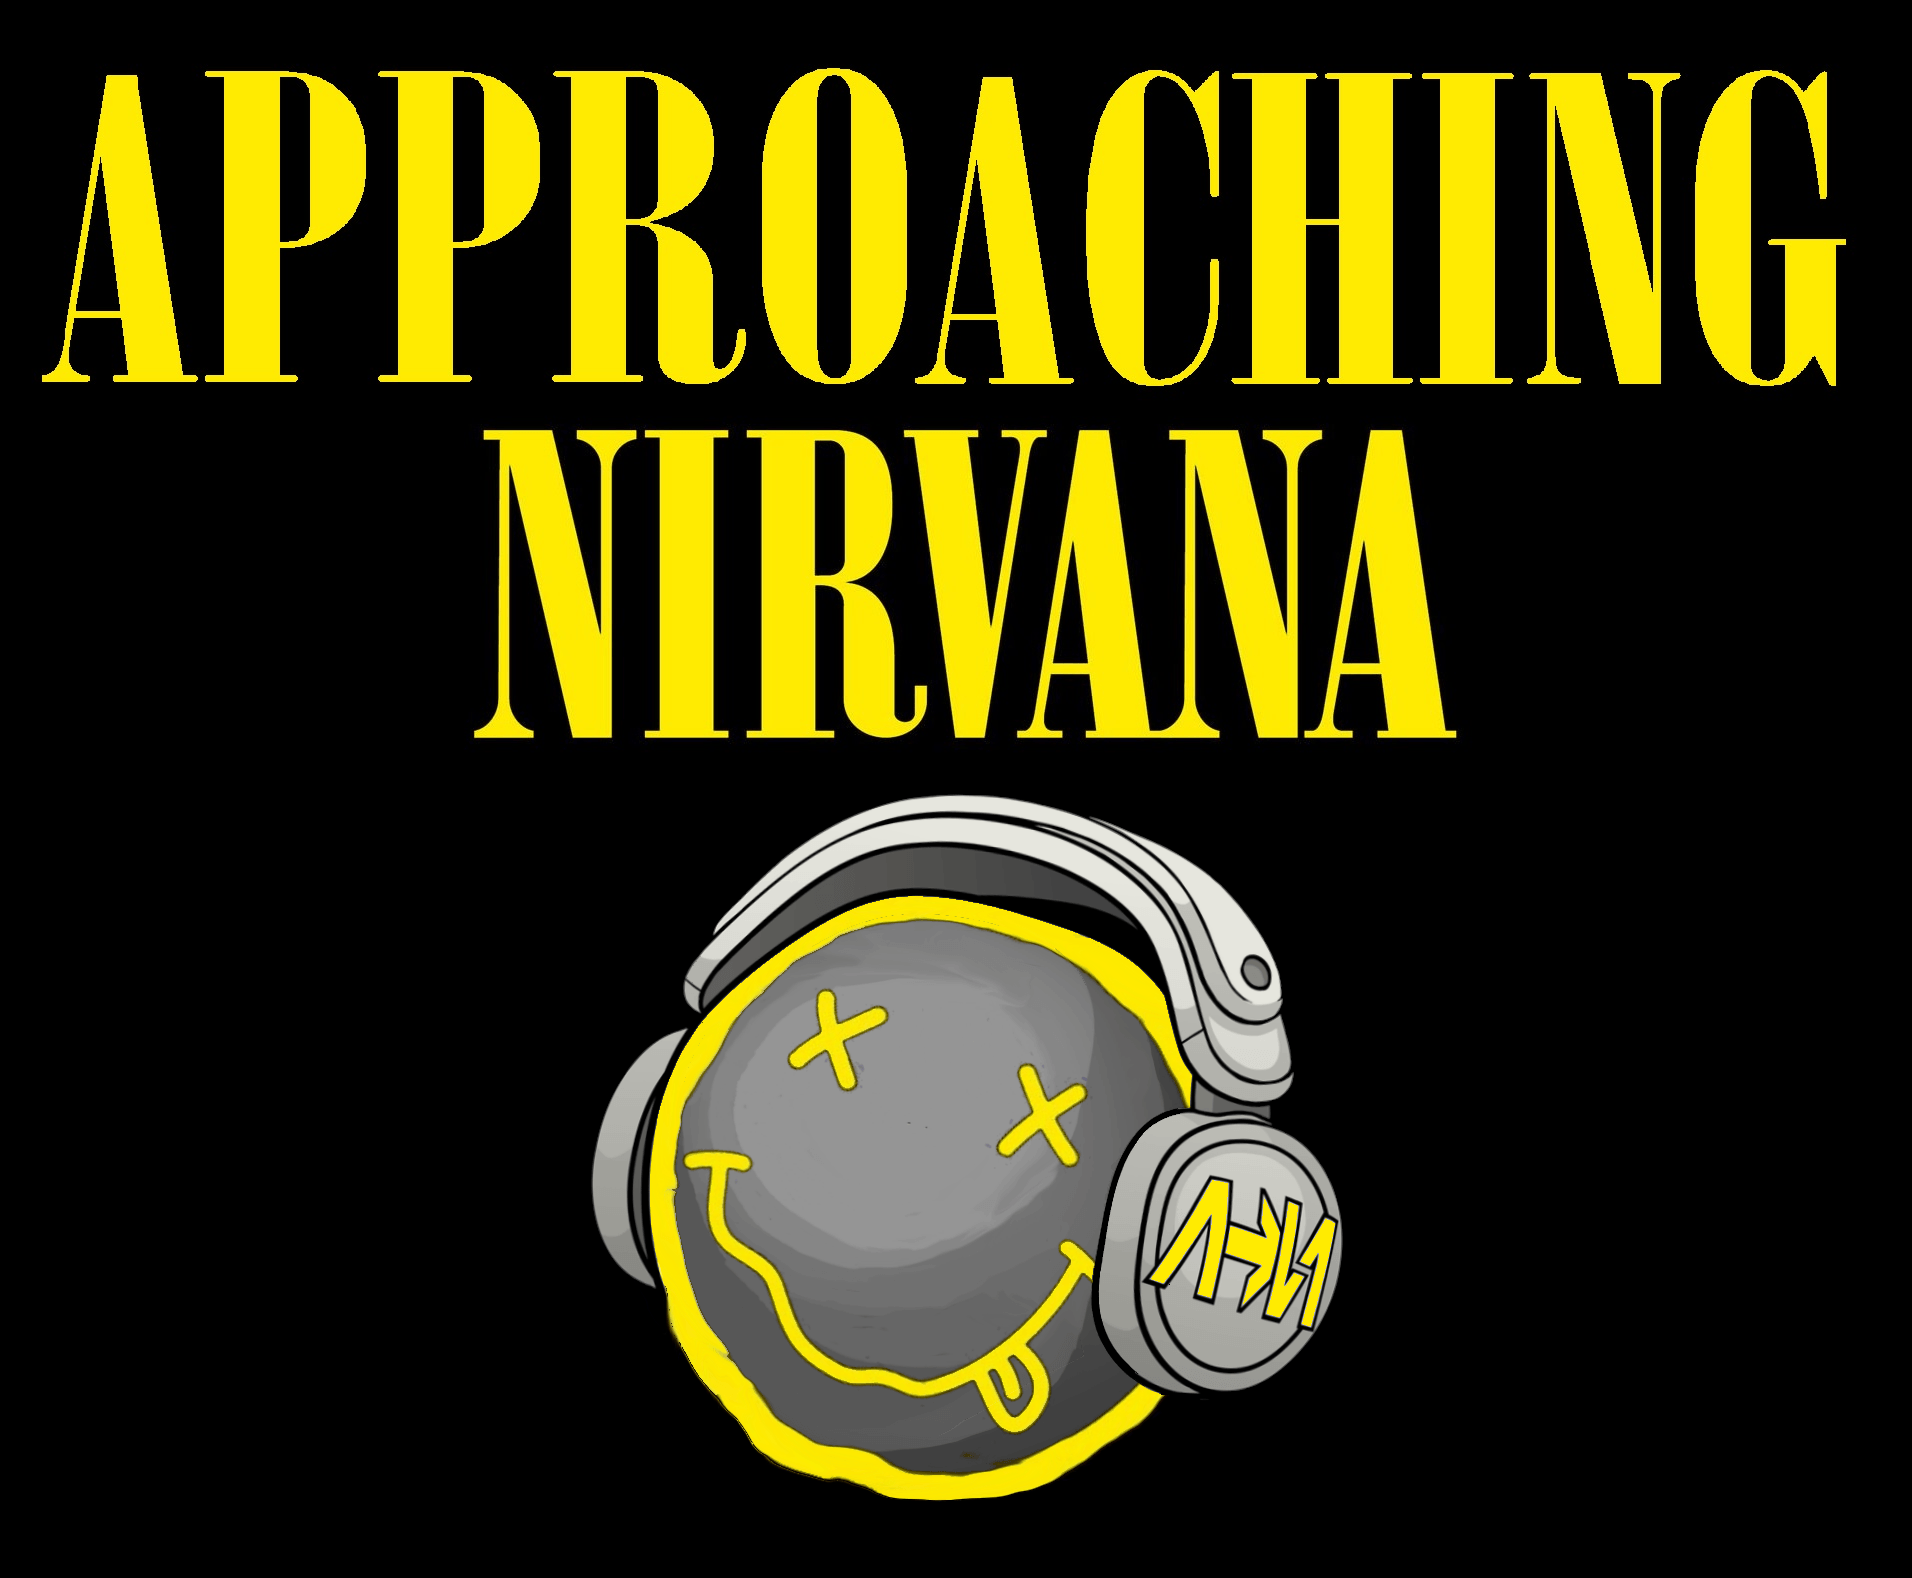 Hd Nirvana Wallpaper Nirvana Logo Wallpapers Wallpaper Cave